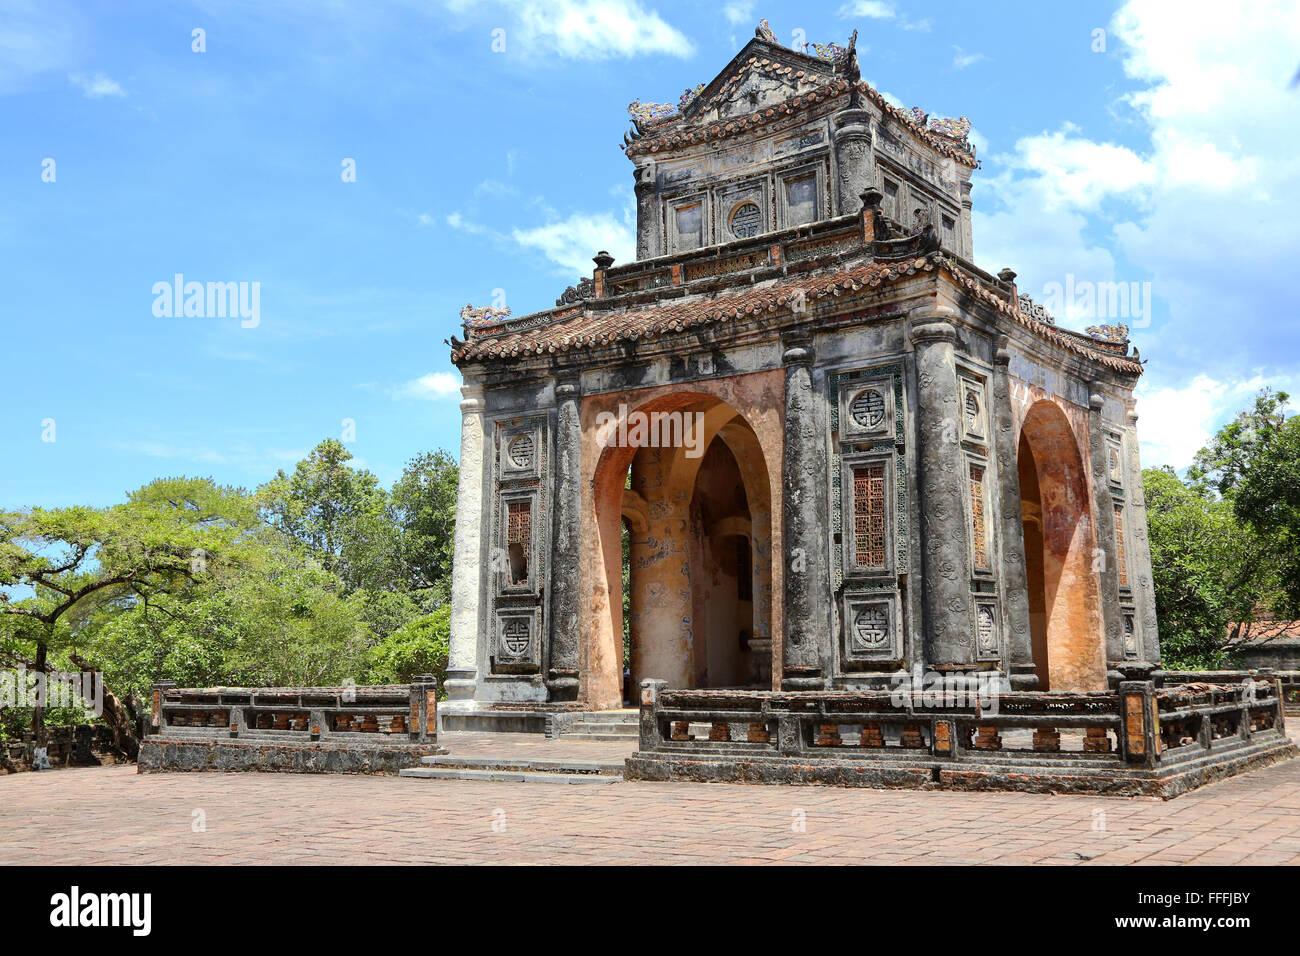 Stele Pavilion at the tomb of Emperor Tu Duc, near Hue, Viet nam - Stock Image